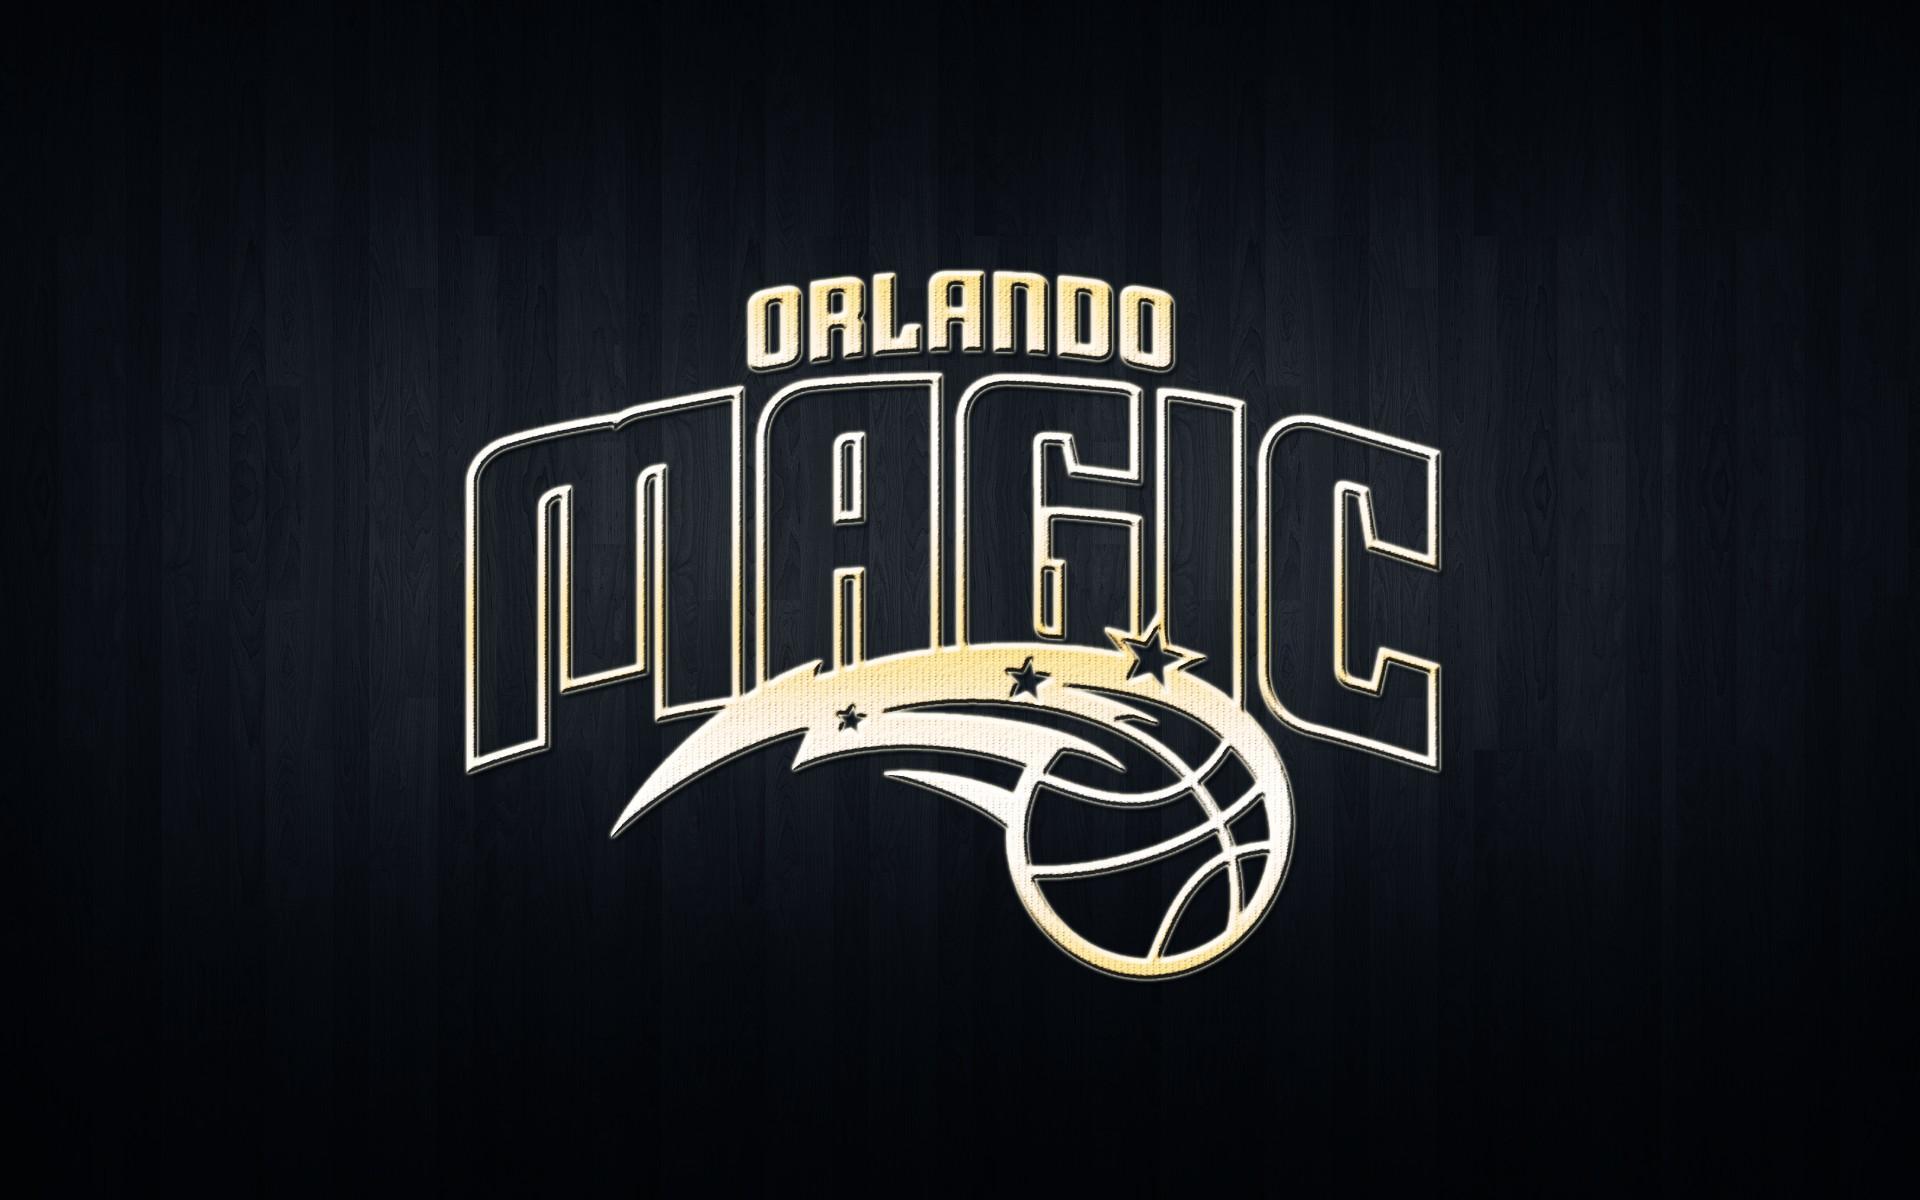 Orlando Magic Wallpapers 1920x1200